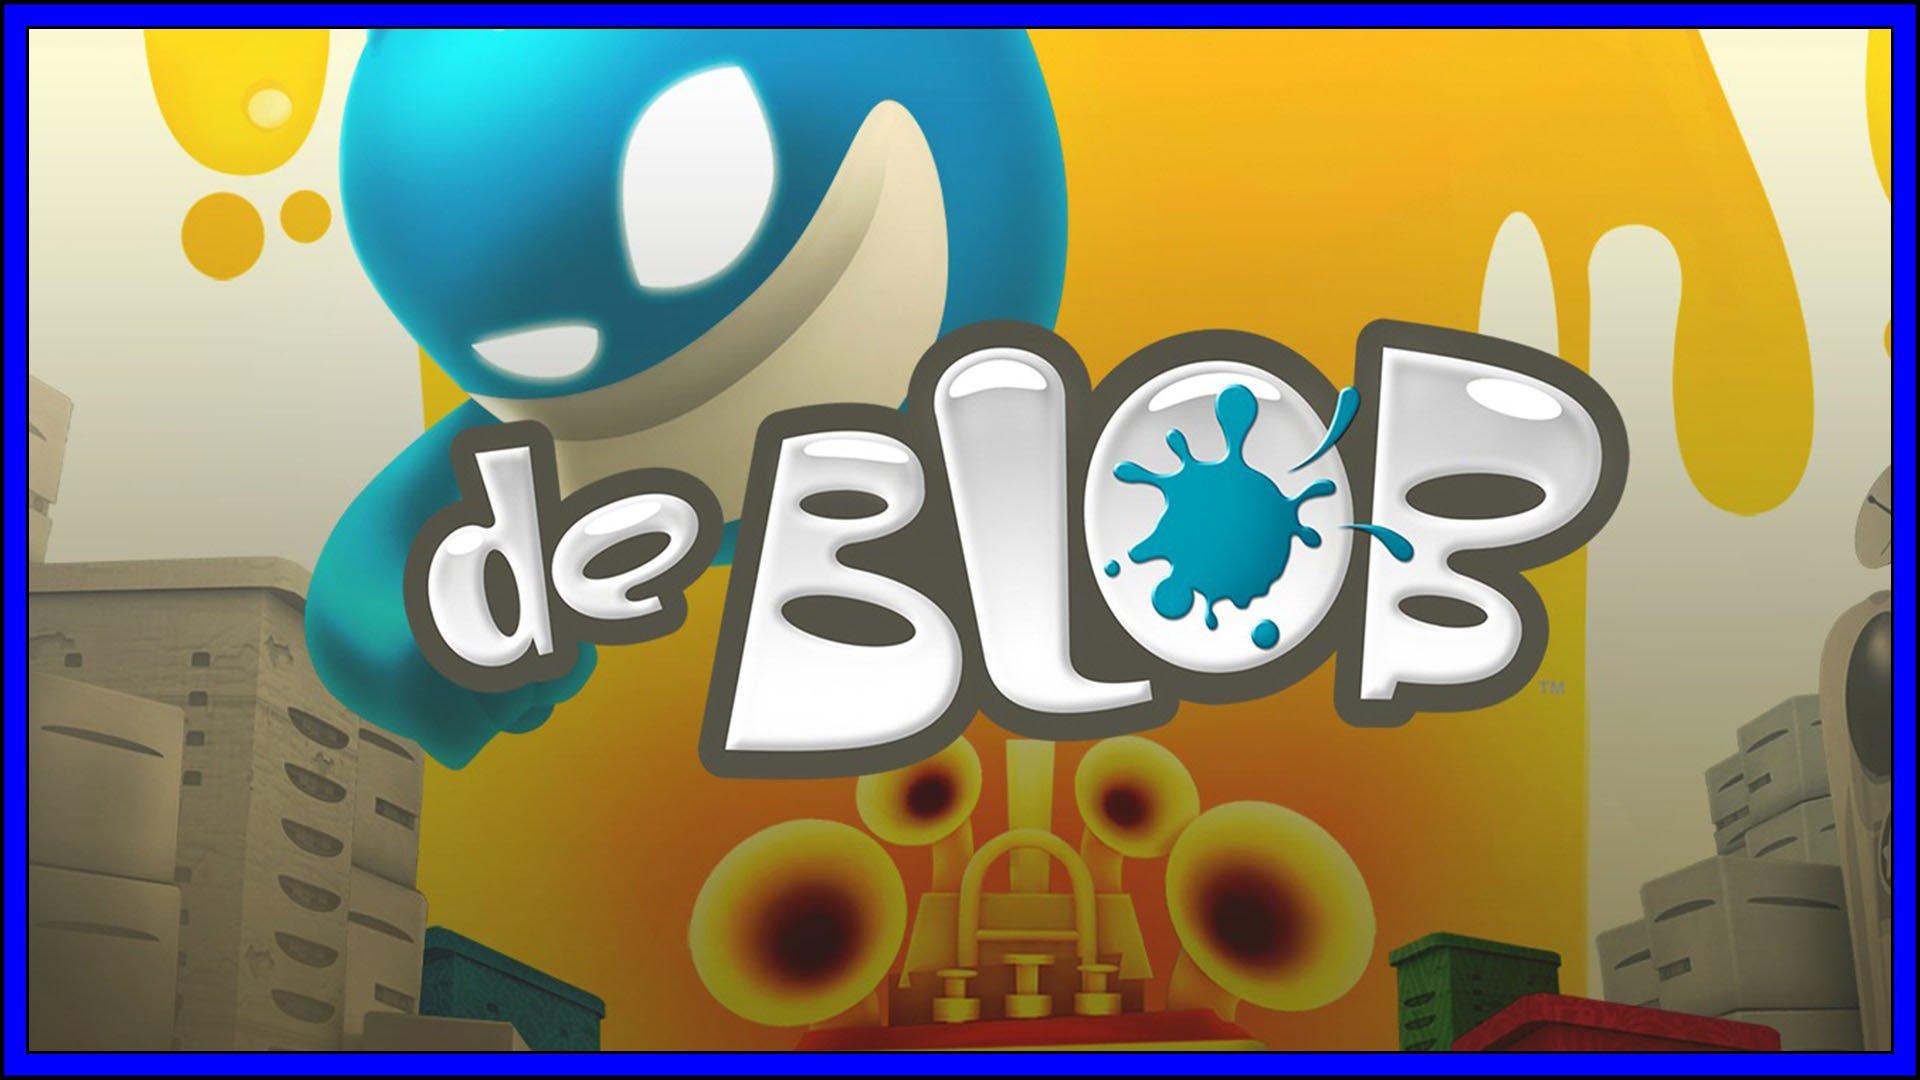 De Blob Fi3